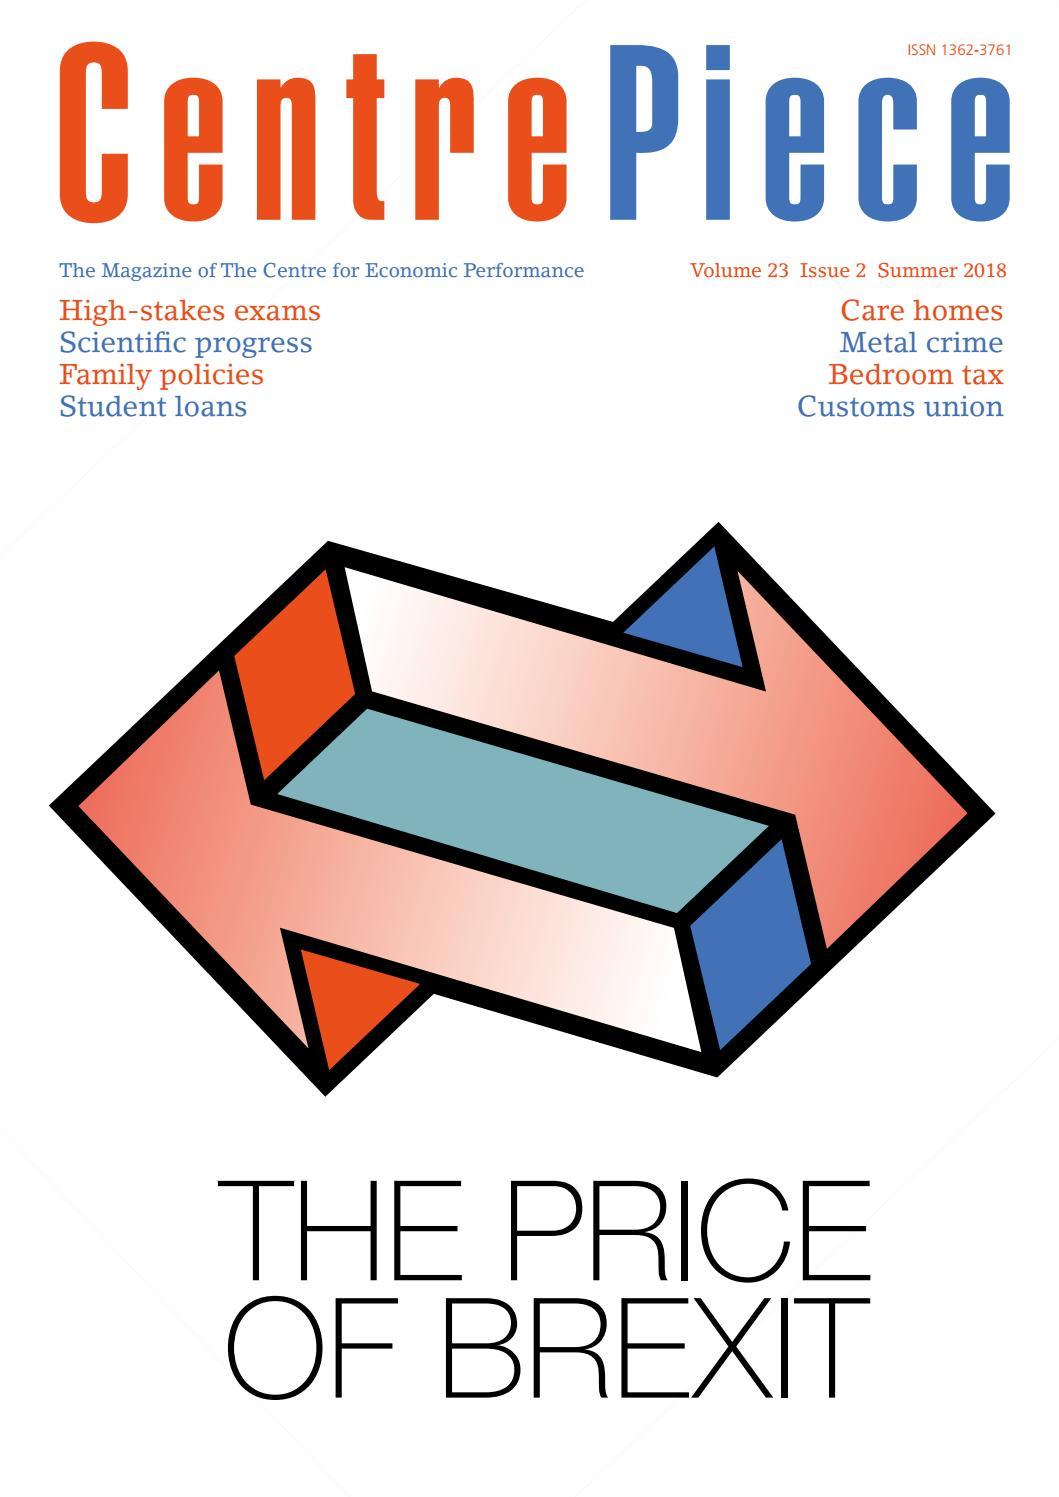 CentrPiece Vol 23 Issue 2